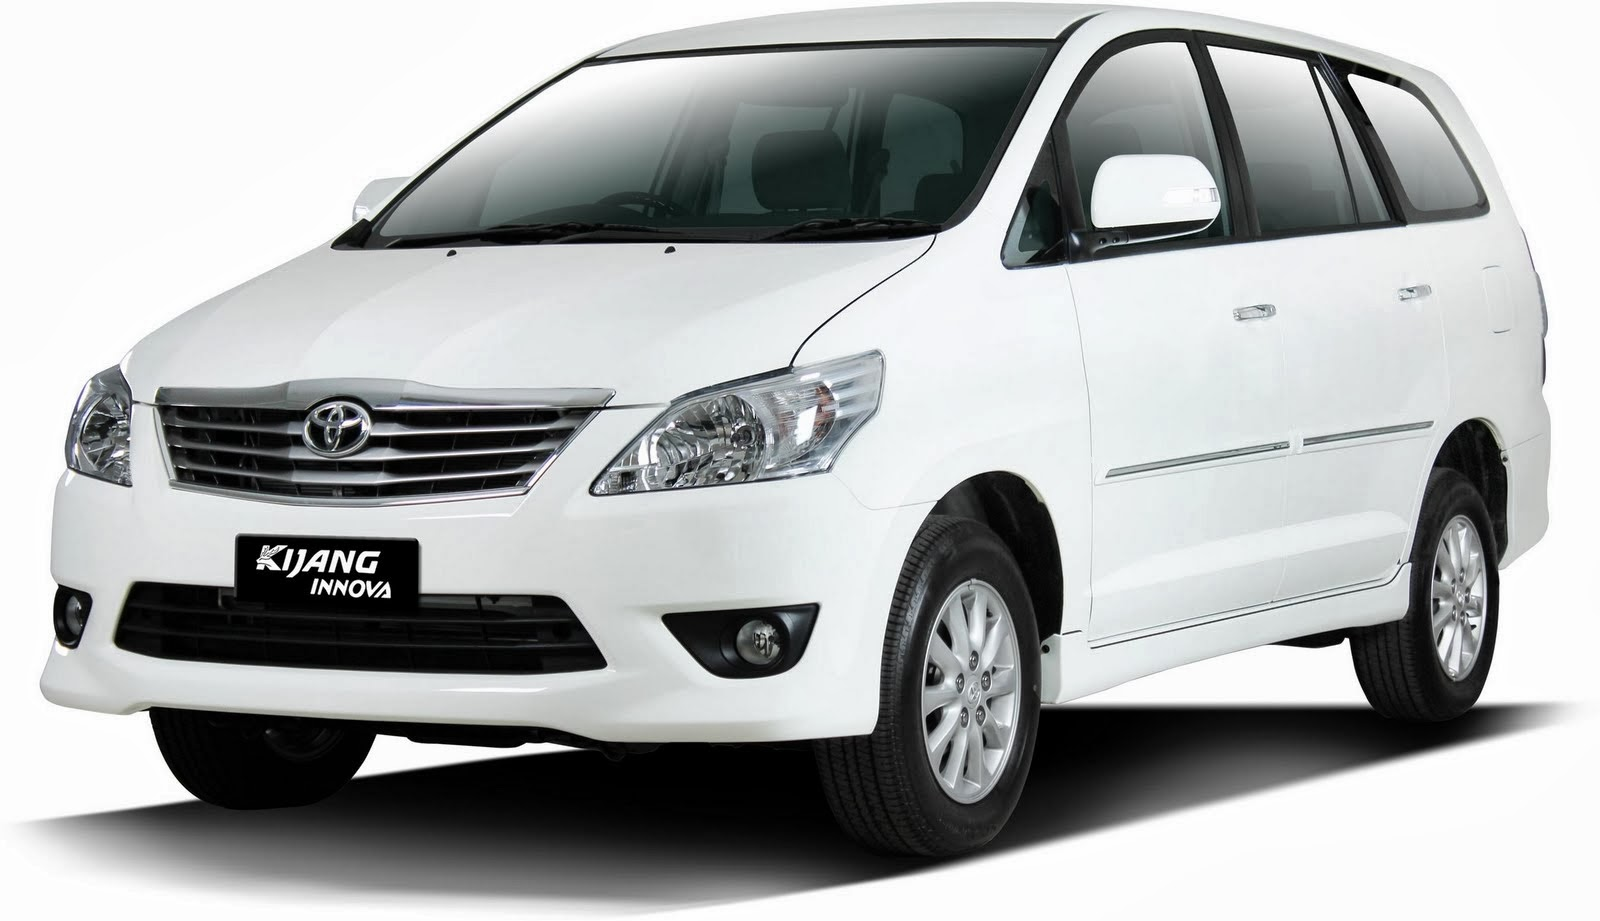 all new kijang innova 2015 grand avanza vs xenia model inova terbaaru autos weblog